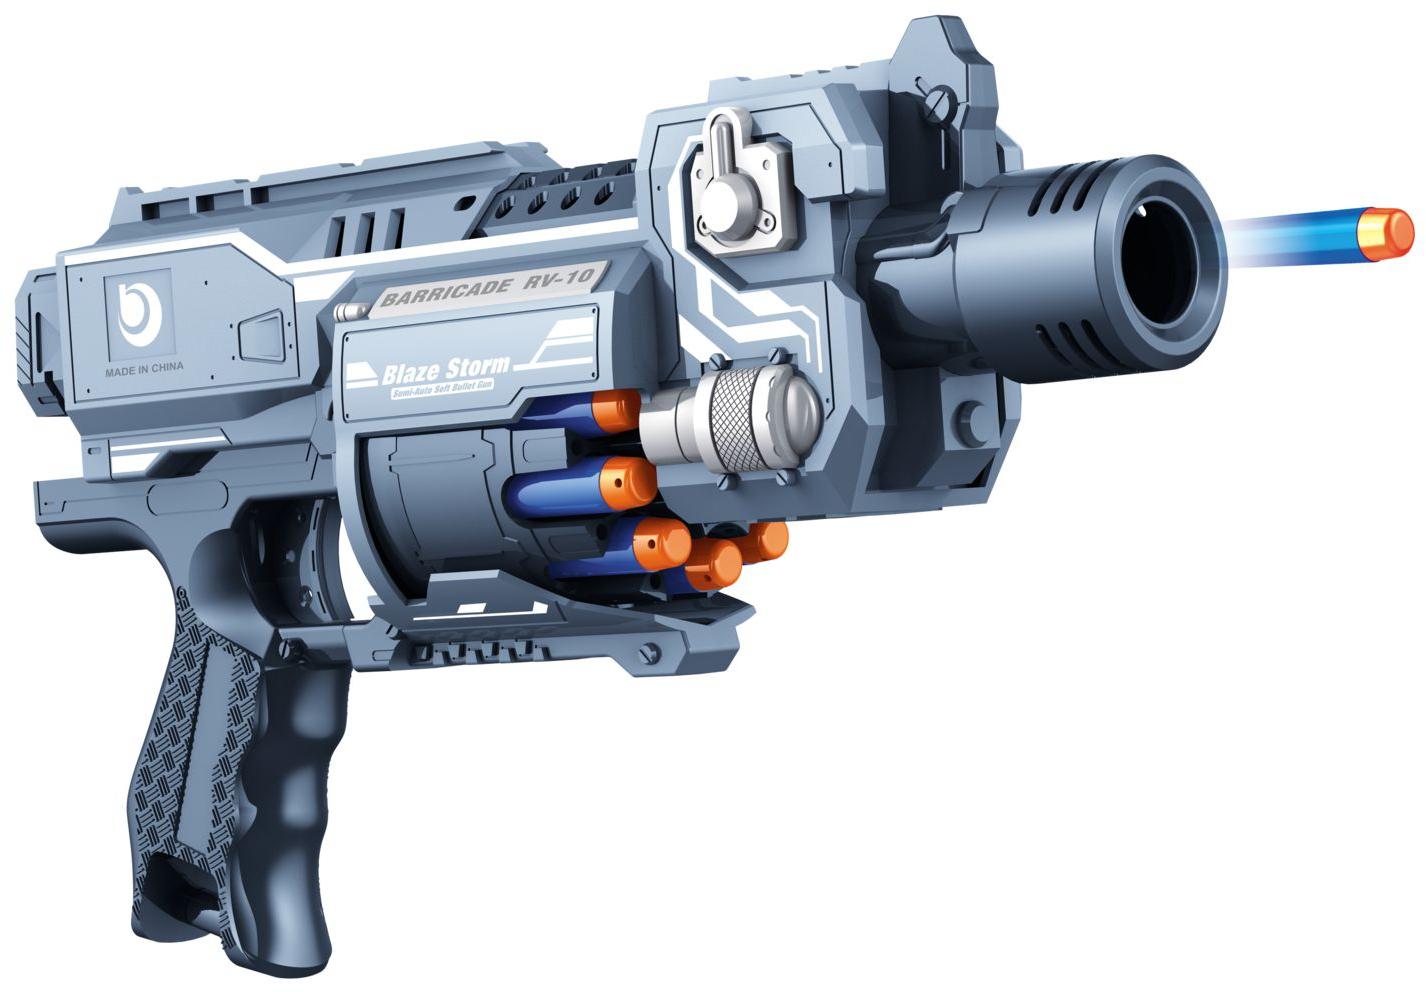 Air blaster – Air blaster neutron el-pistol soft bullet med 20 pile, +10 stk. på lager på pixizoo